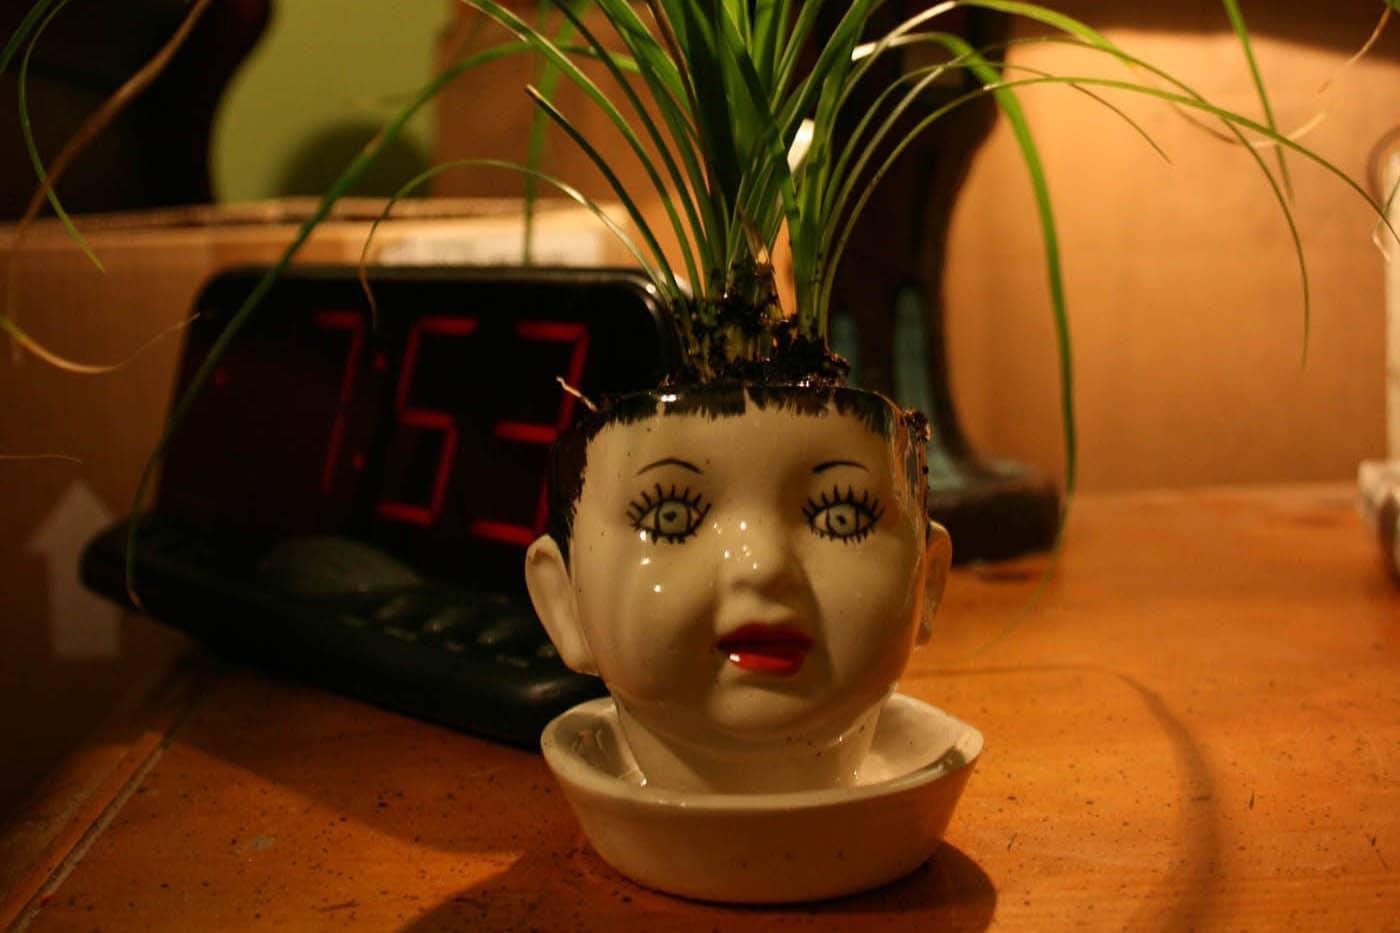 Doll head planter.